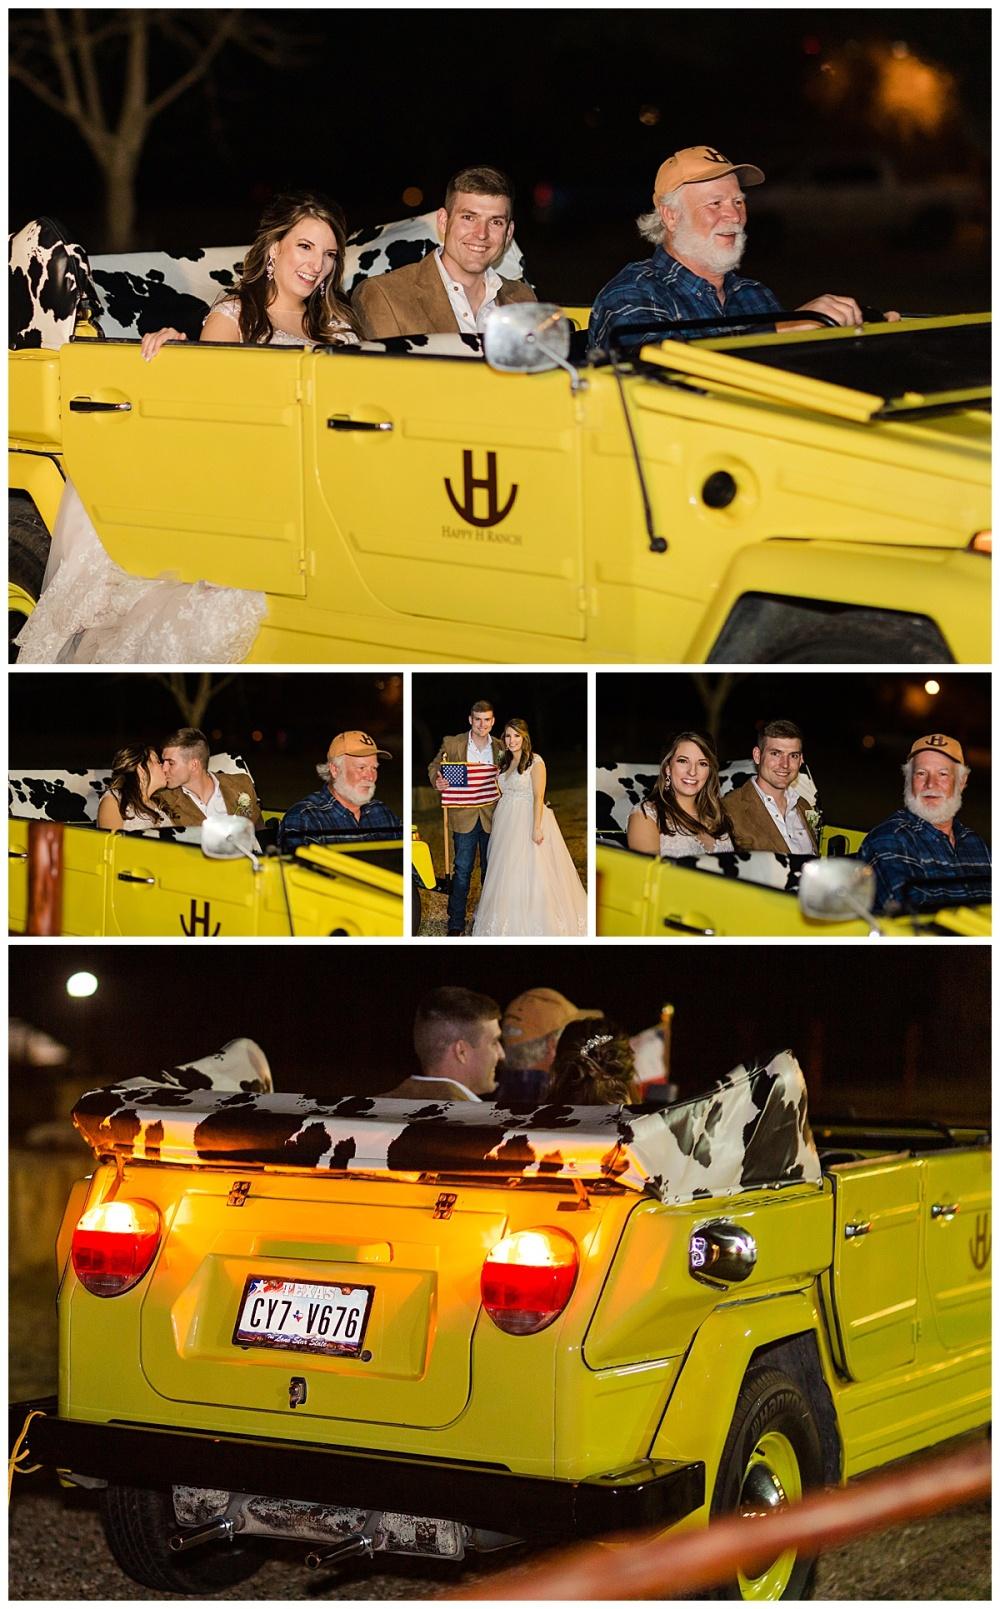 Wedding-Photographer-Texas-Hill-Country-Happy-H-Ranch-Comfor-Texas-Carly-Barton-Photography_0055.jpg